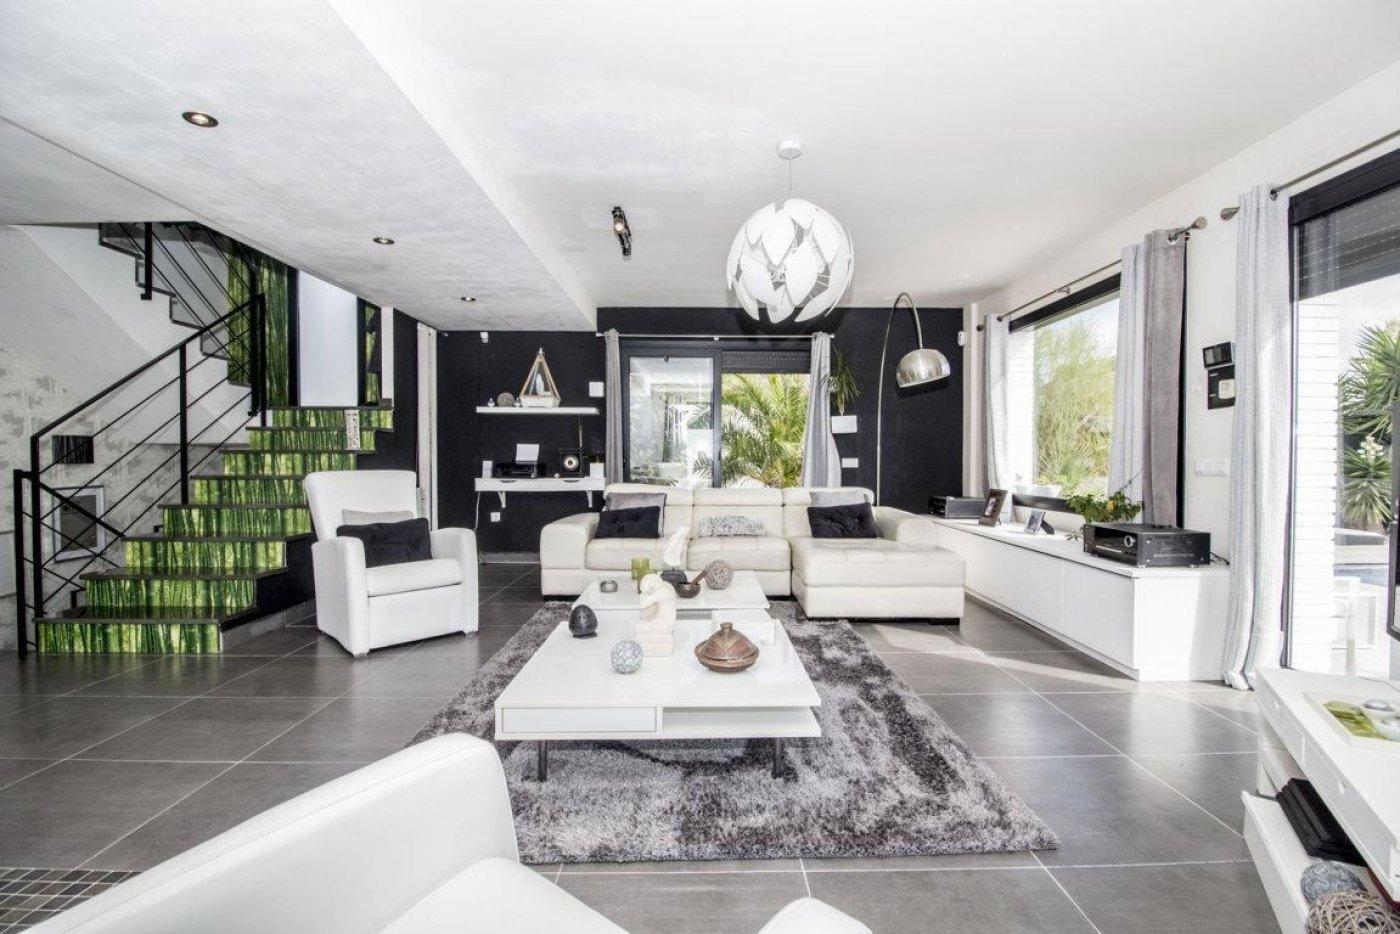 Casa exclusiva con piscina - imagenInmueble3